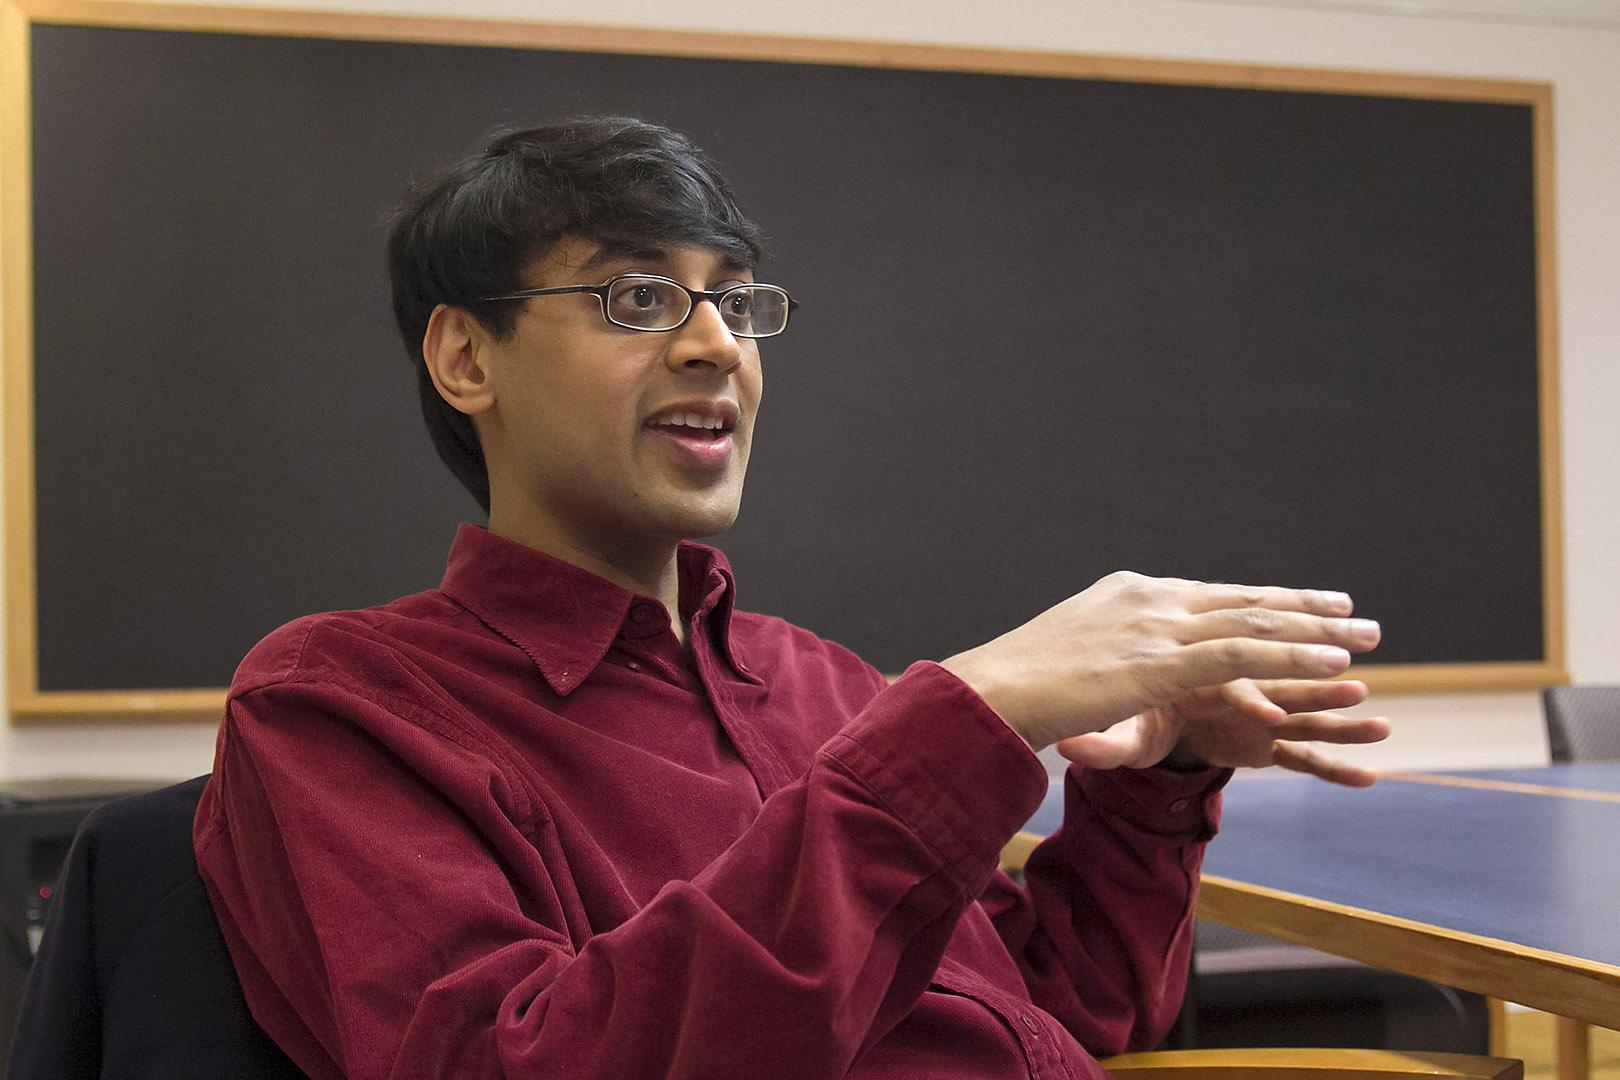 https://7ganj.ir/img/2015/12/Manjul_Bhargava-Bates-2015-Commencement.jpg